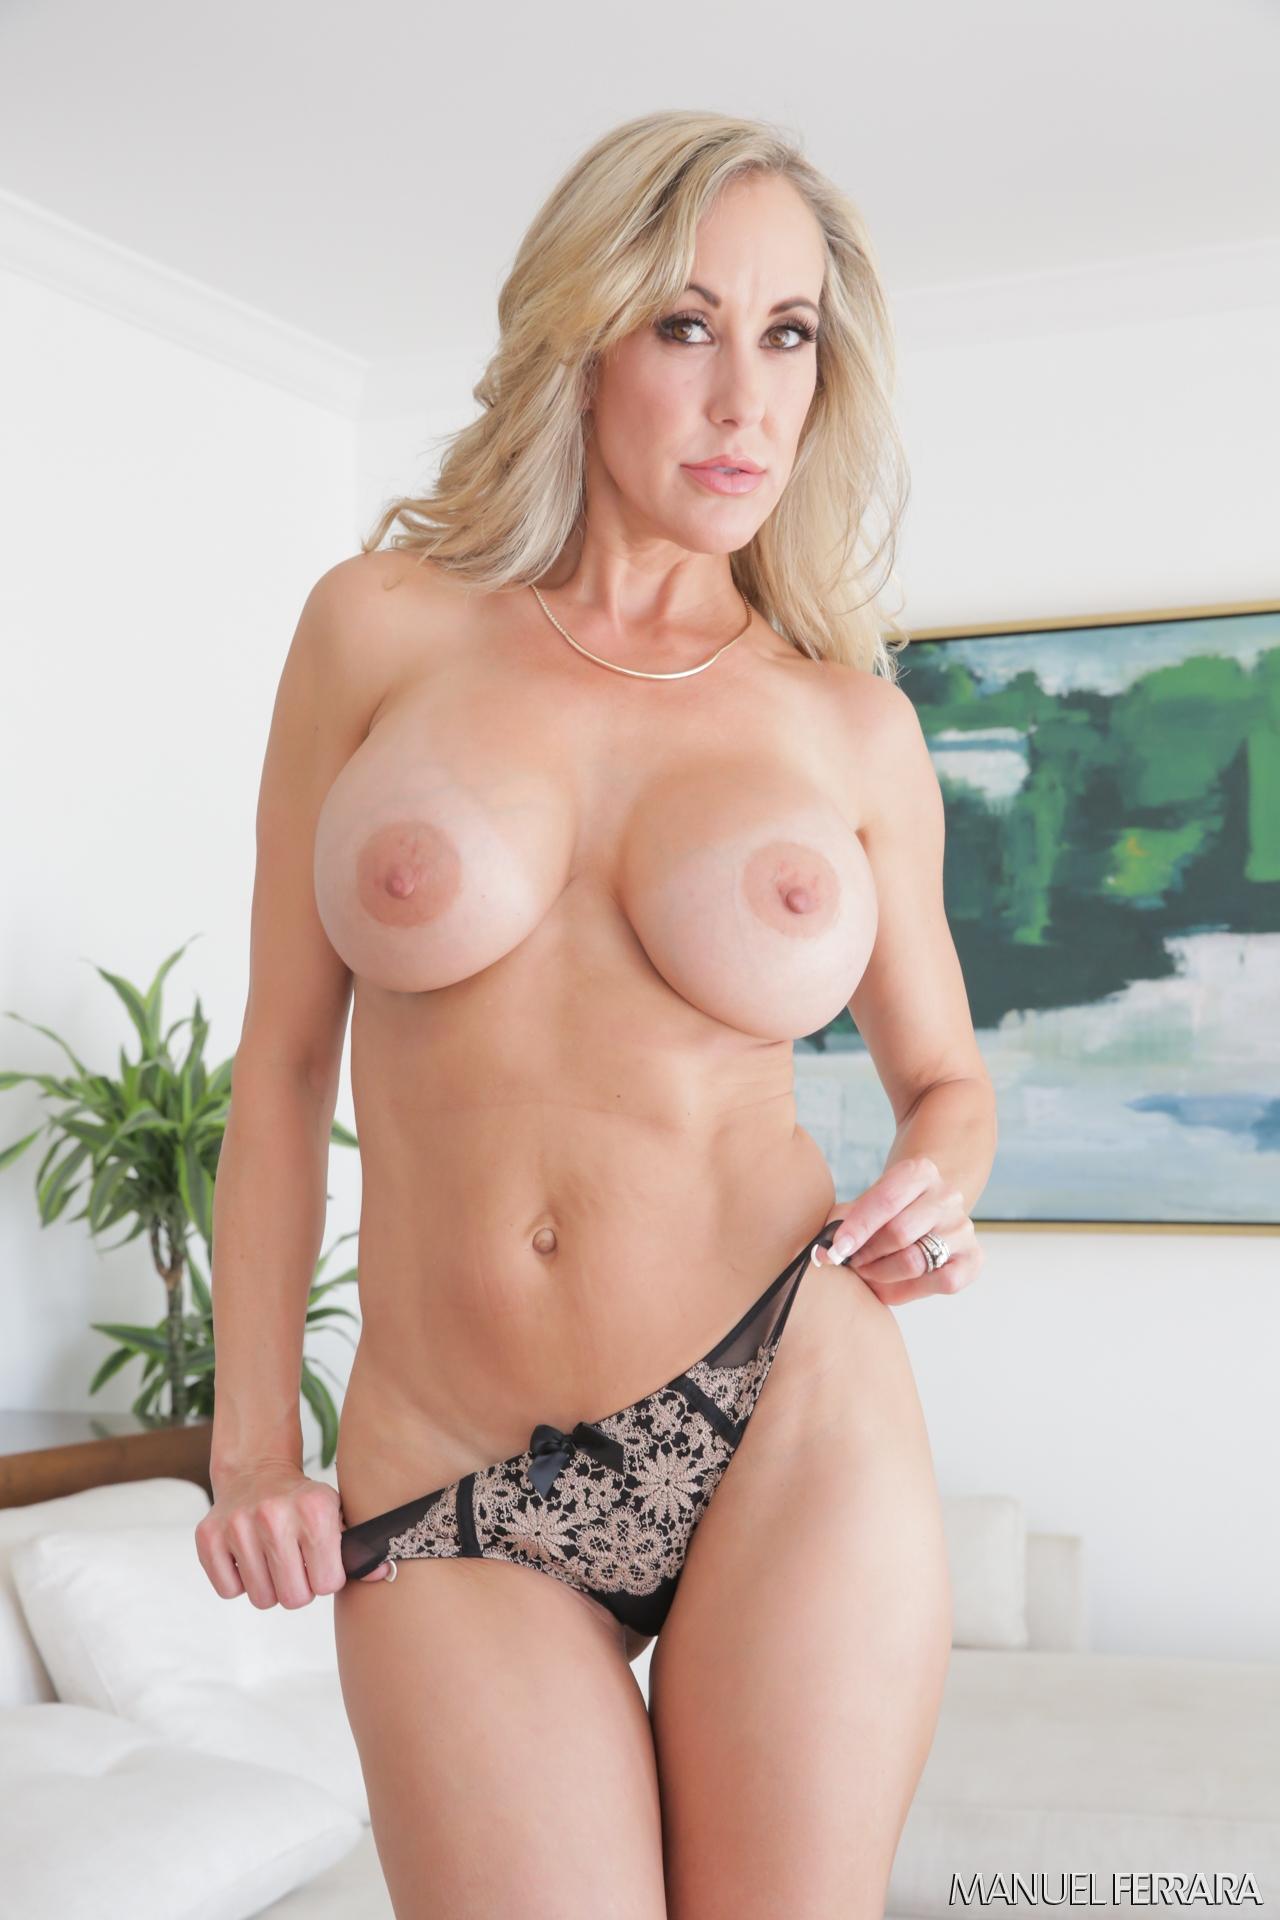 Free list of top mature pornstars masturbation milf favorite